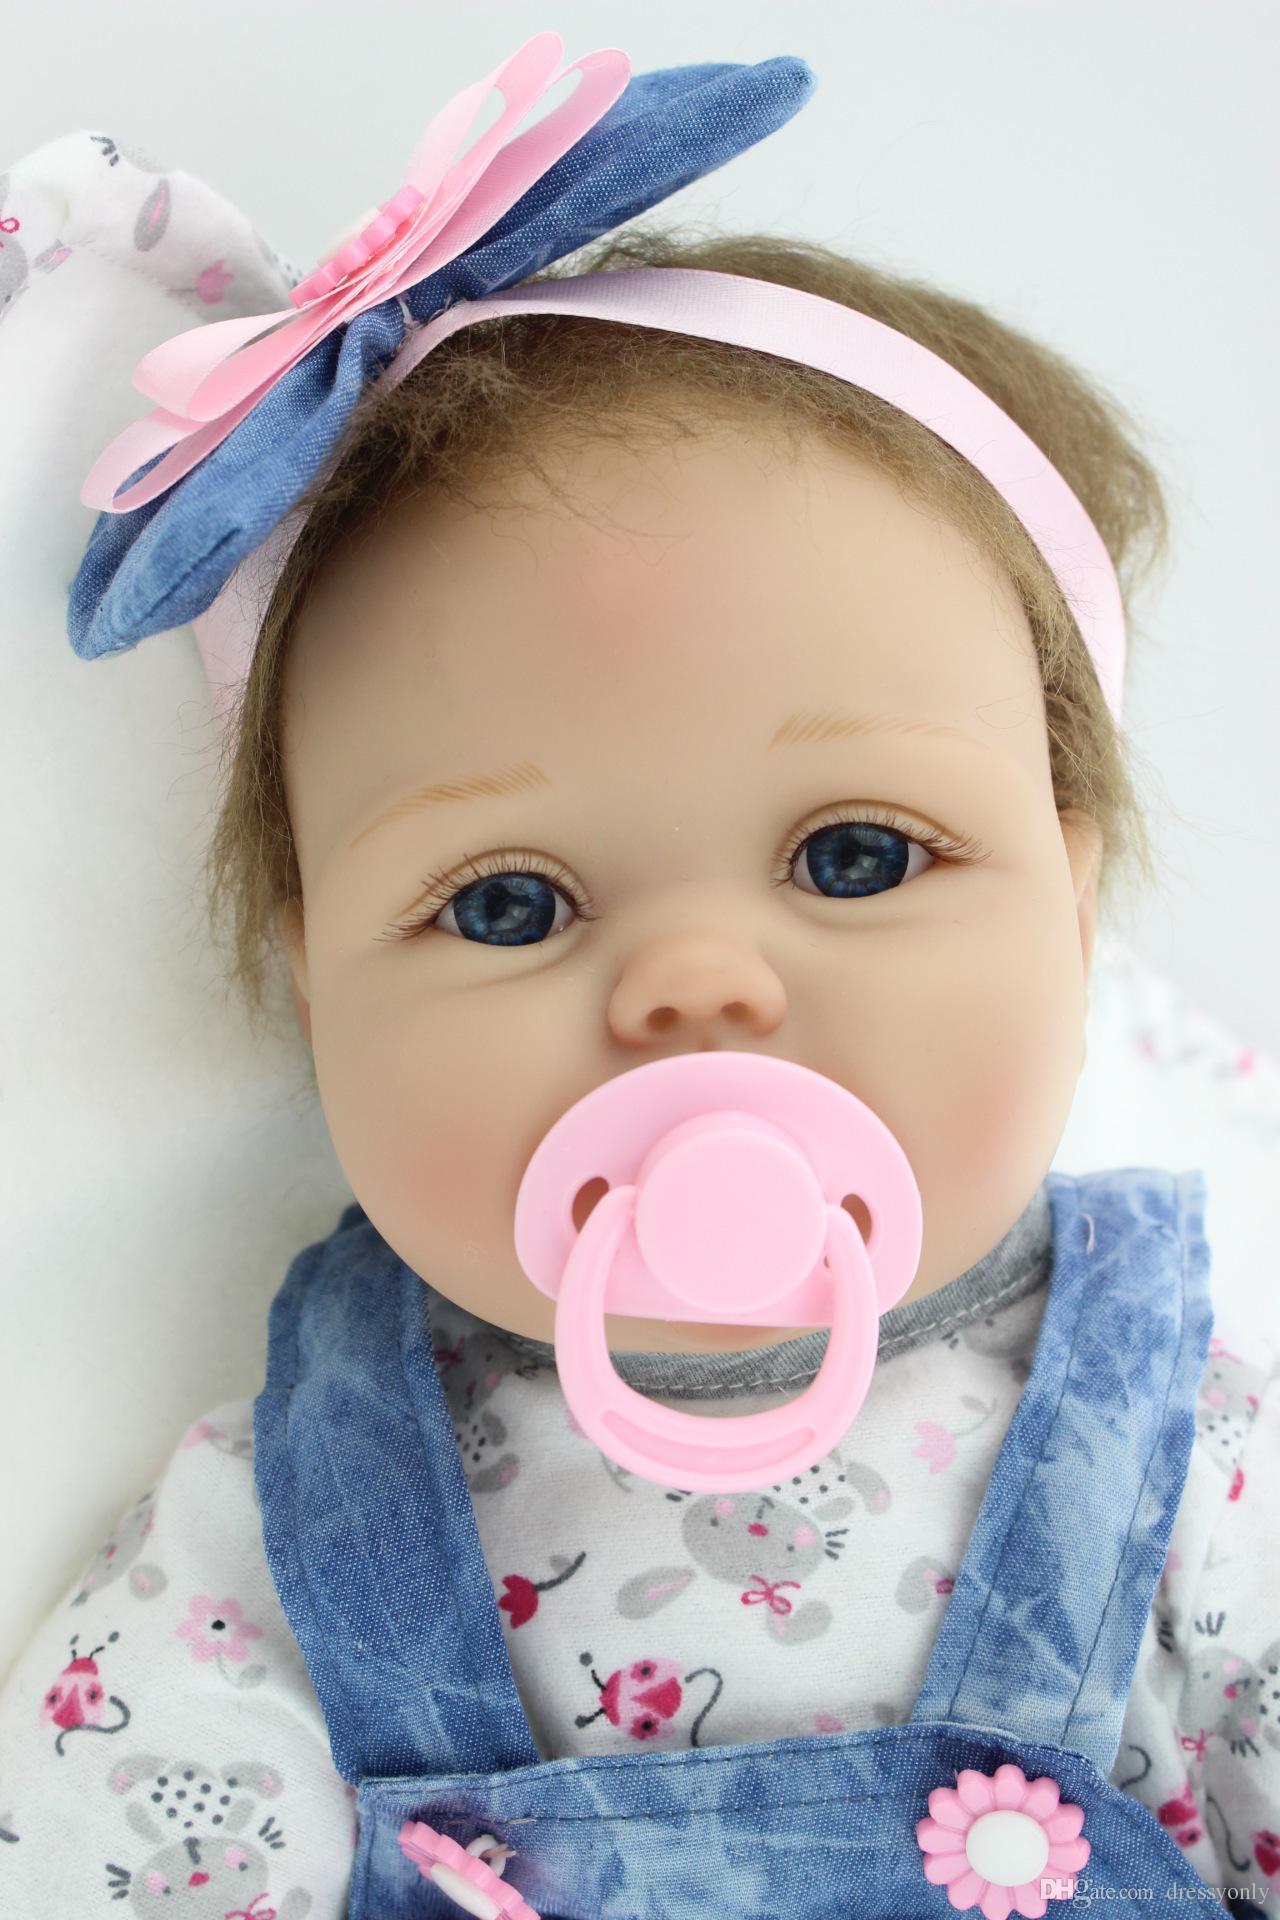 b4b212fa413 Reborn Dolls NPK Handmade Lifelike Newborn Baby Doll Silicone Full Body